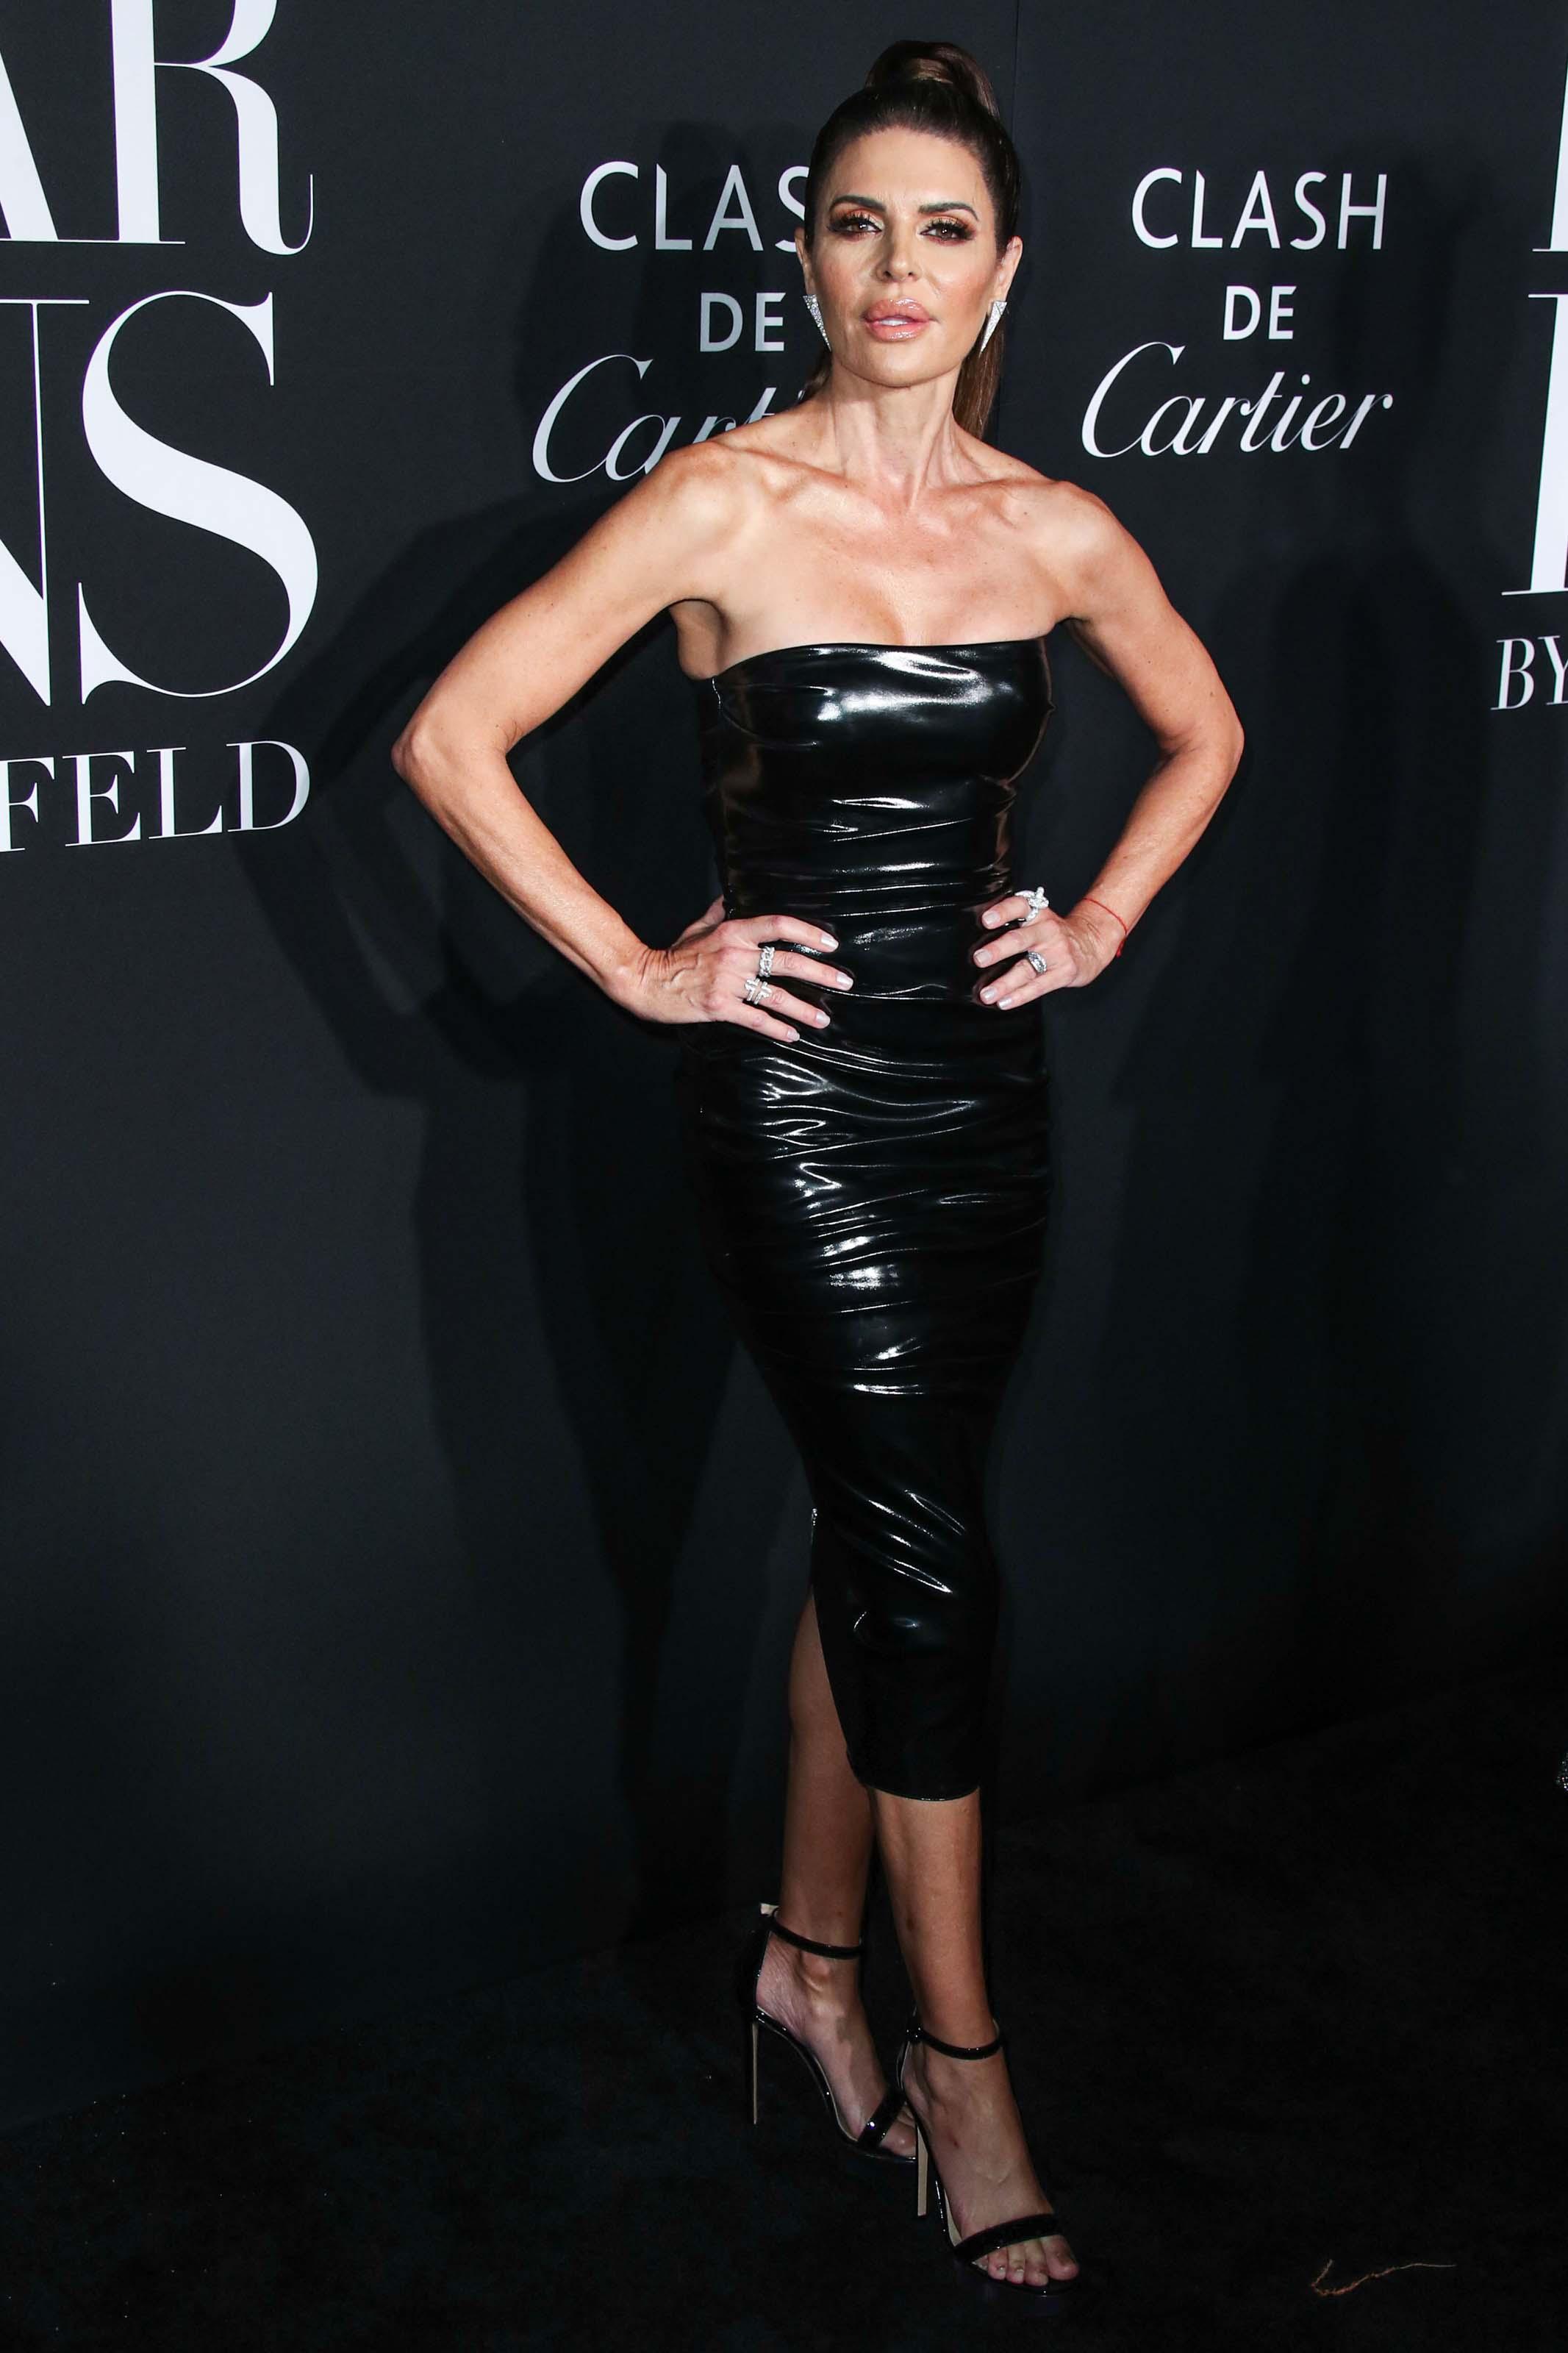 Lisa Rinna attends Harper's Bazaar icons event